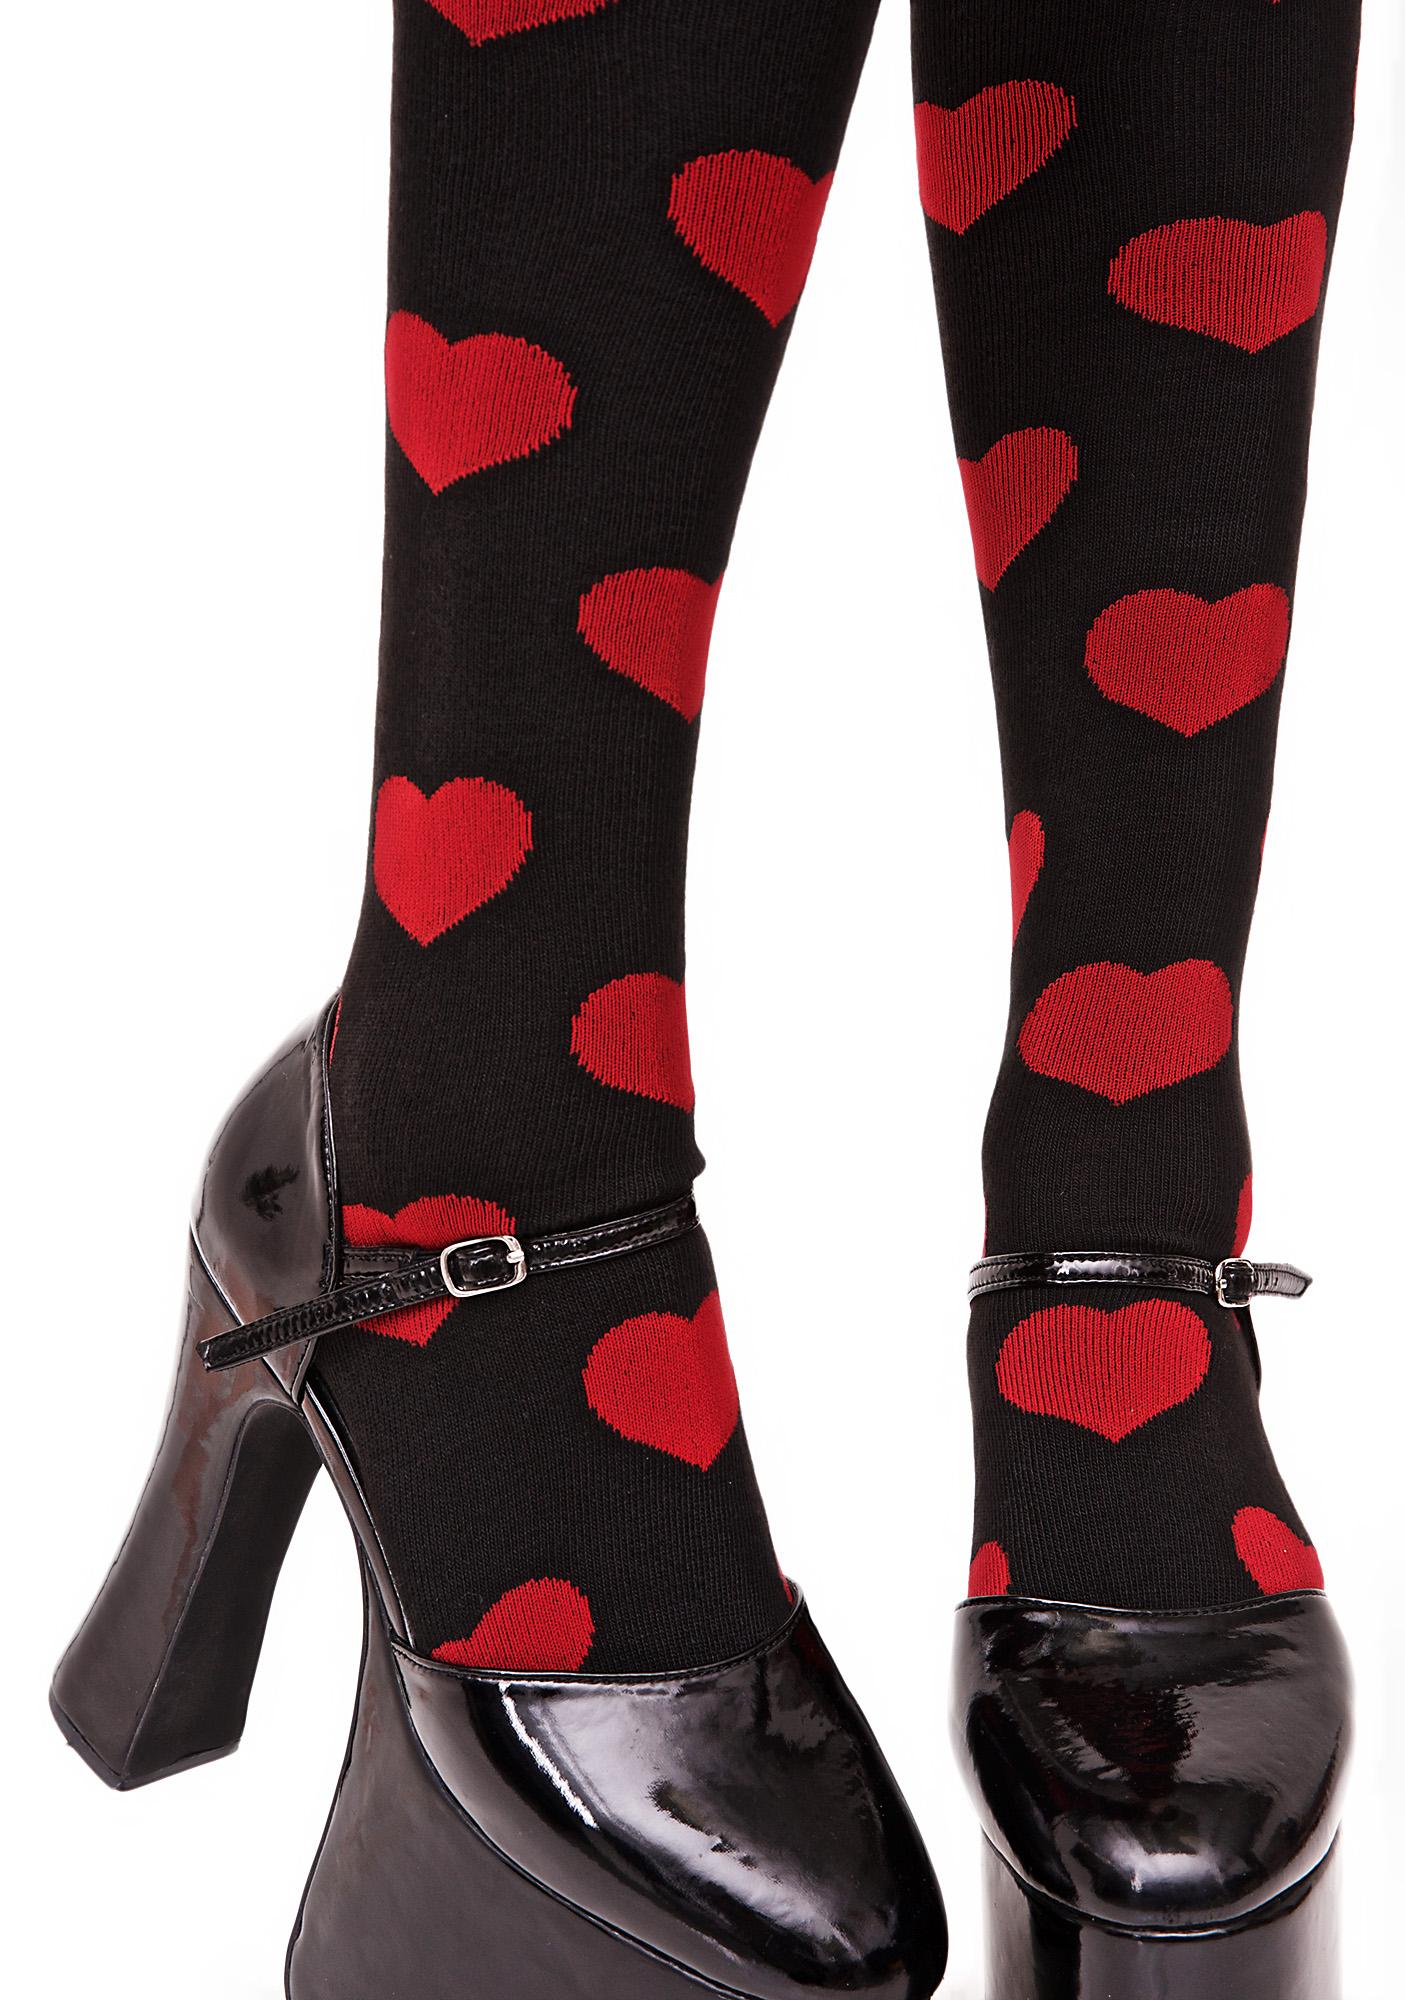 Game of Love Knee Highs